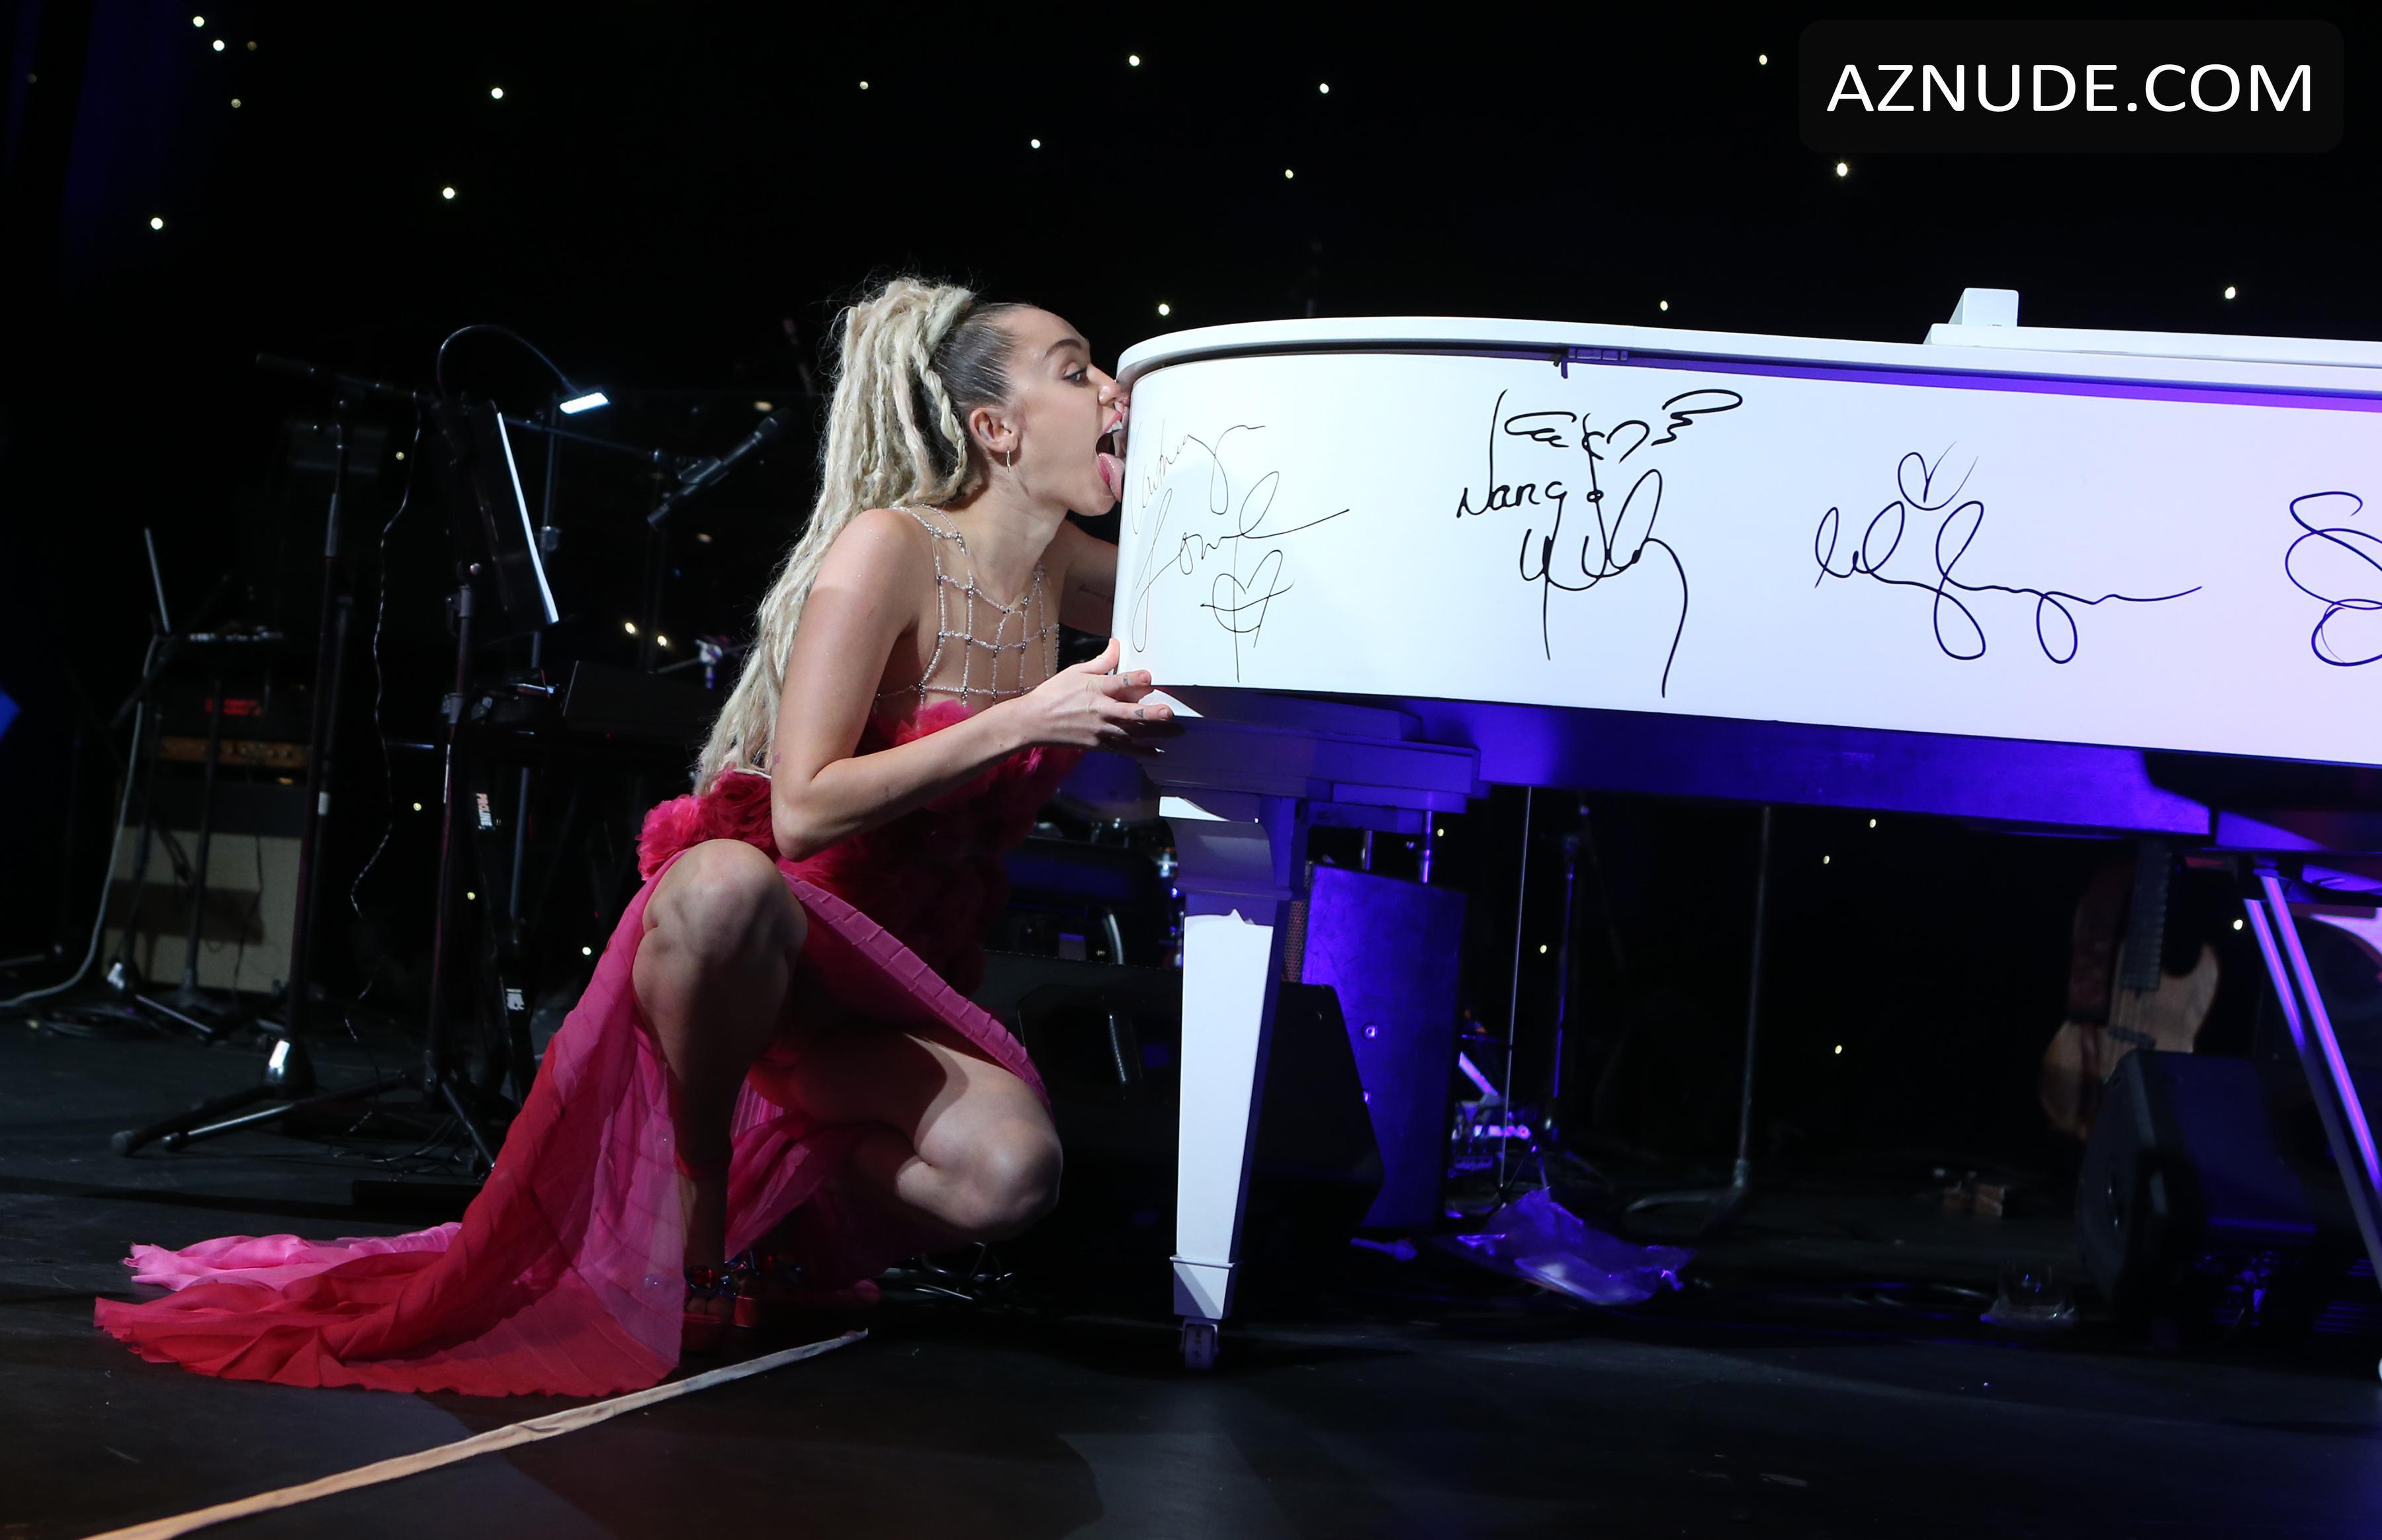 Topless Miley Cyrus Nude In Concert Jpg